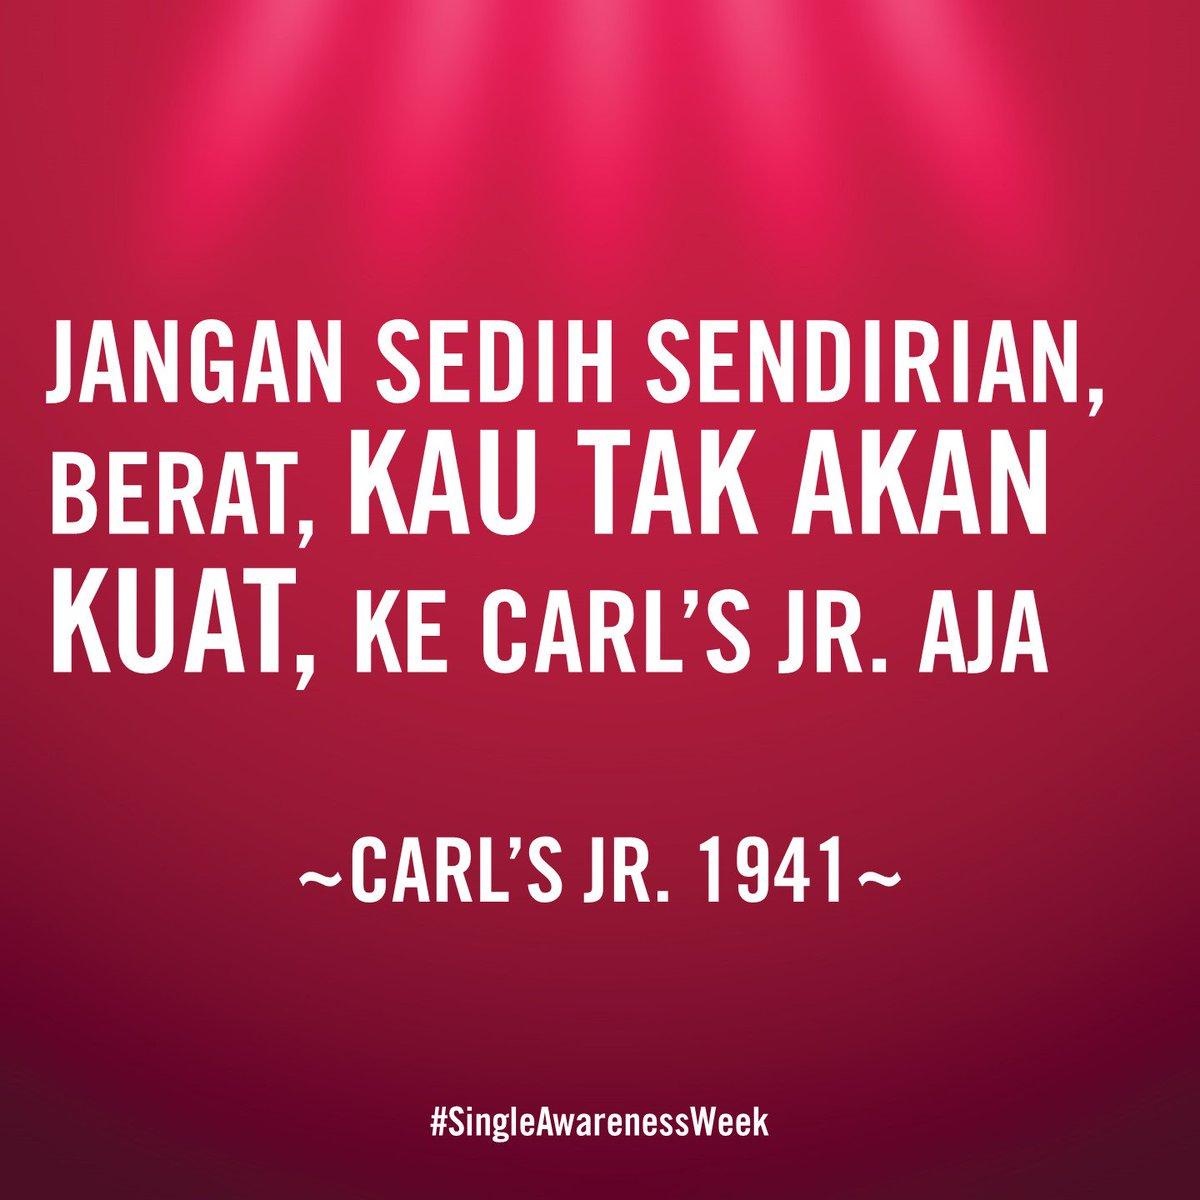 Carl S Jr Indonesia On Twitter Jangan Sedih Sendirian Berat Kau